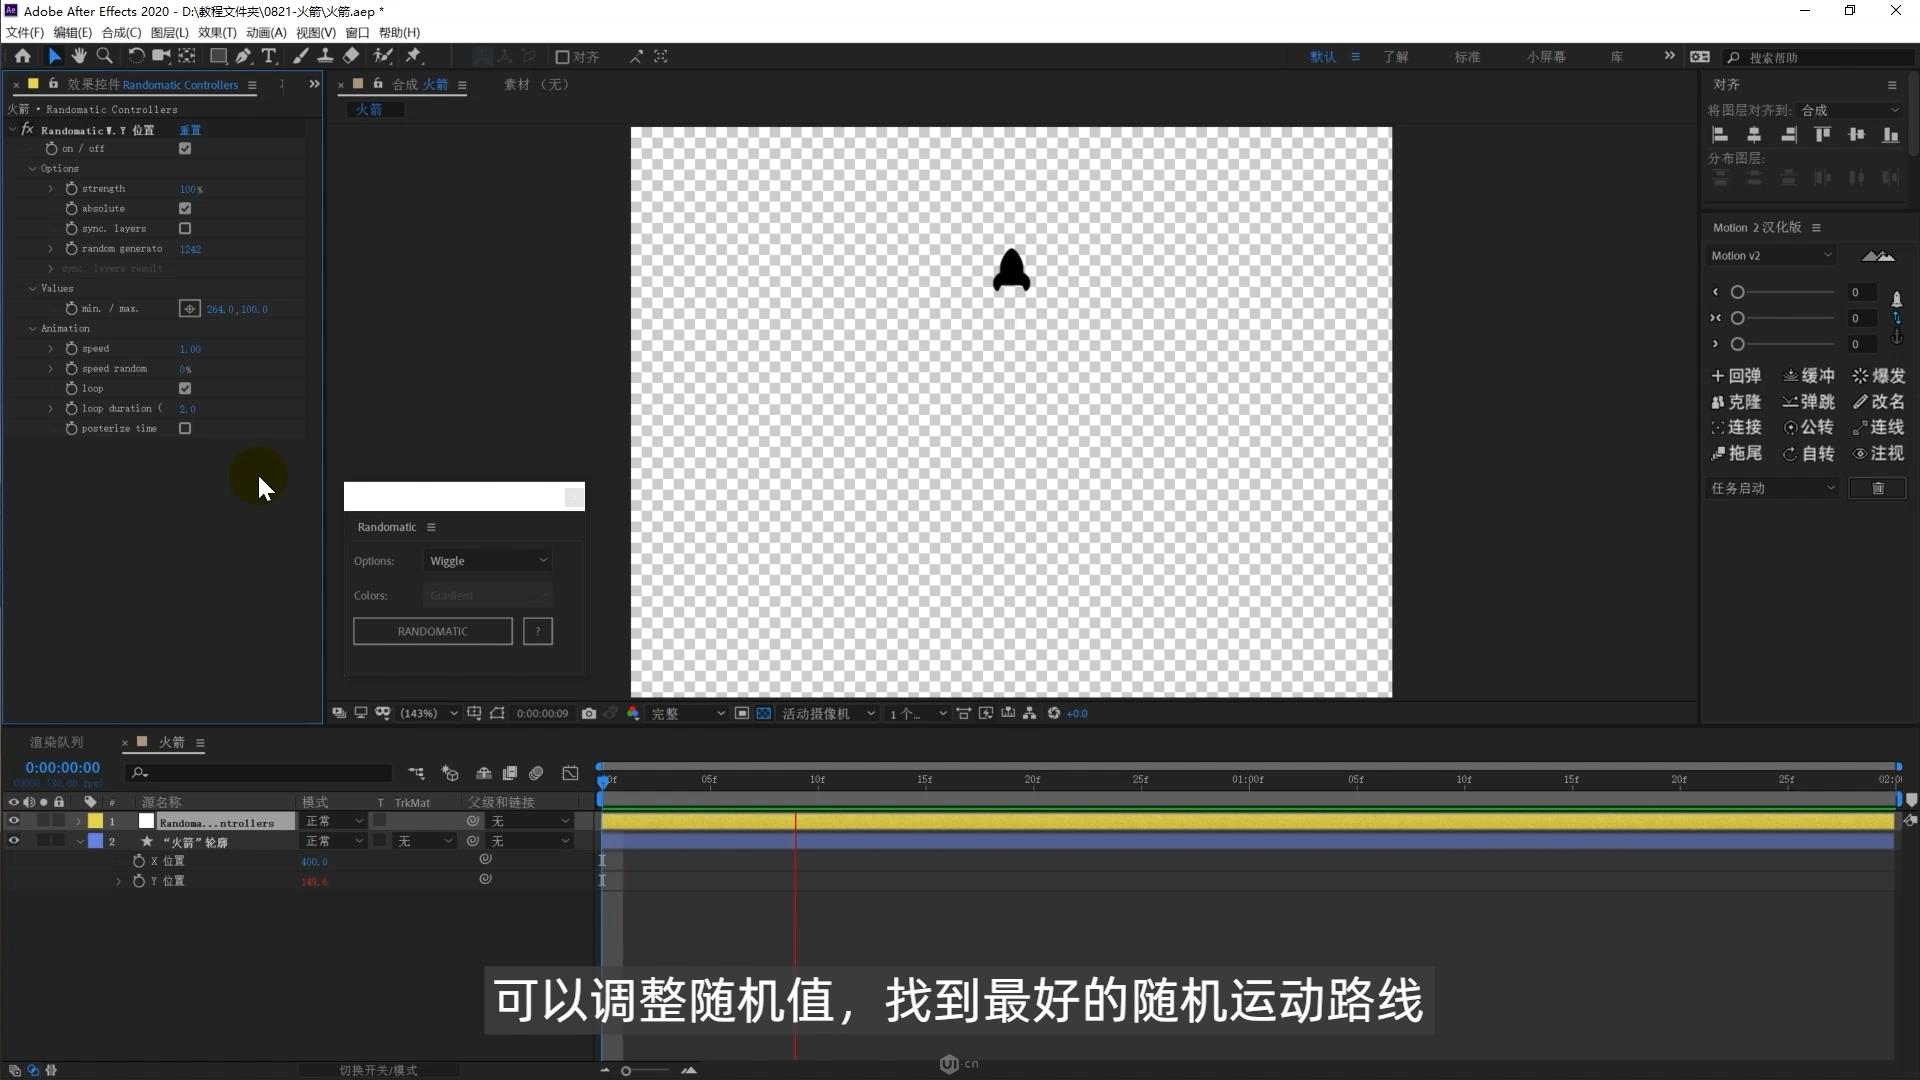 AE如何制作简单的太空旅行MG动画(5)